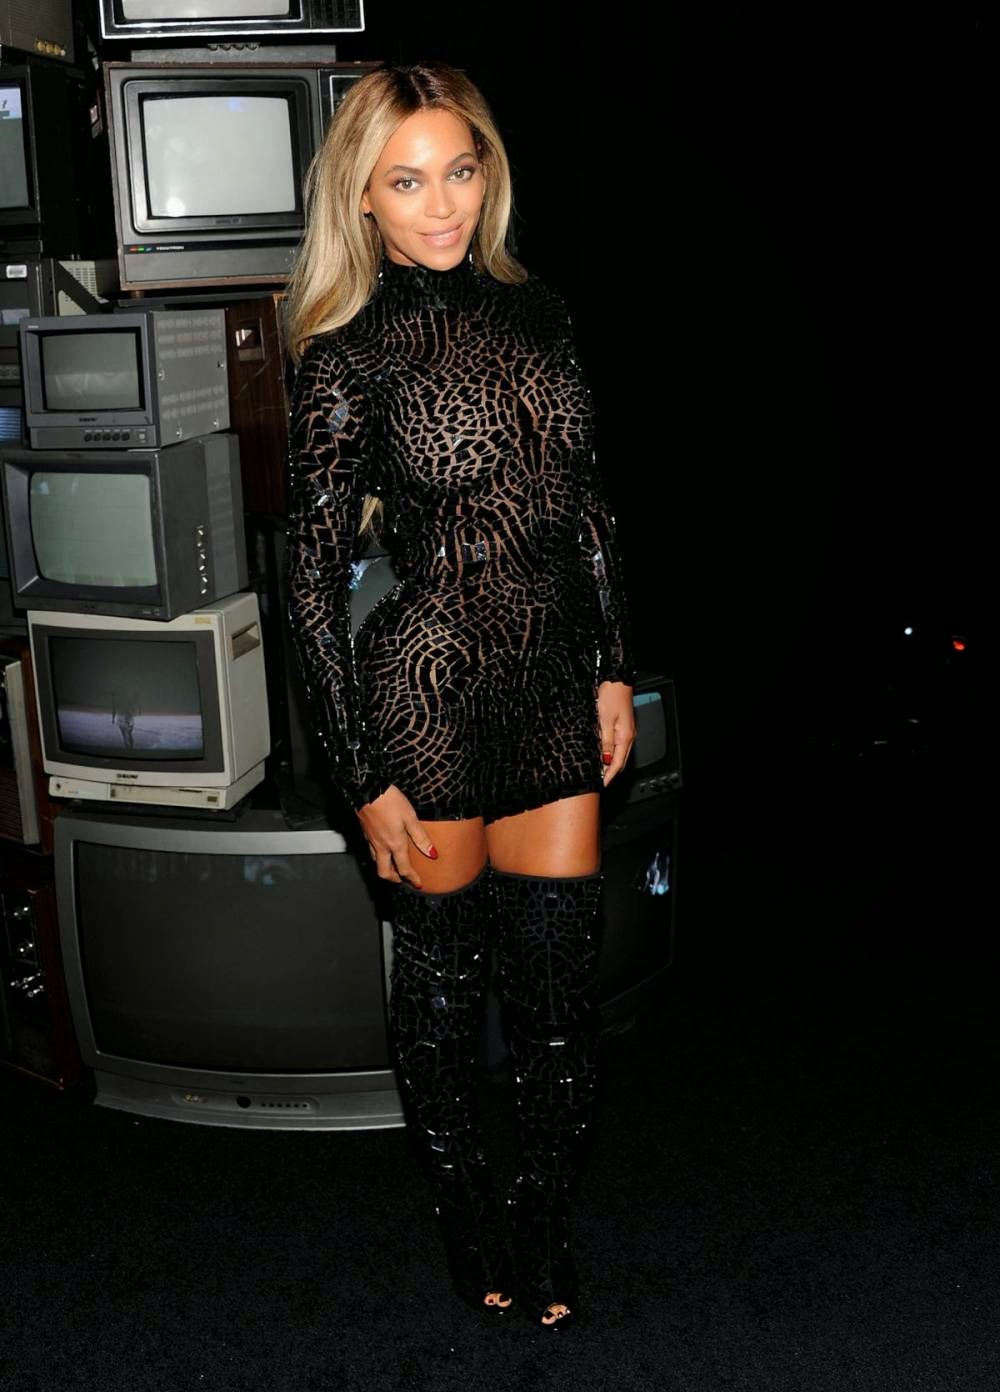 Beyonce-Thailand-2 - SAWFIRST